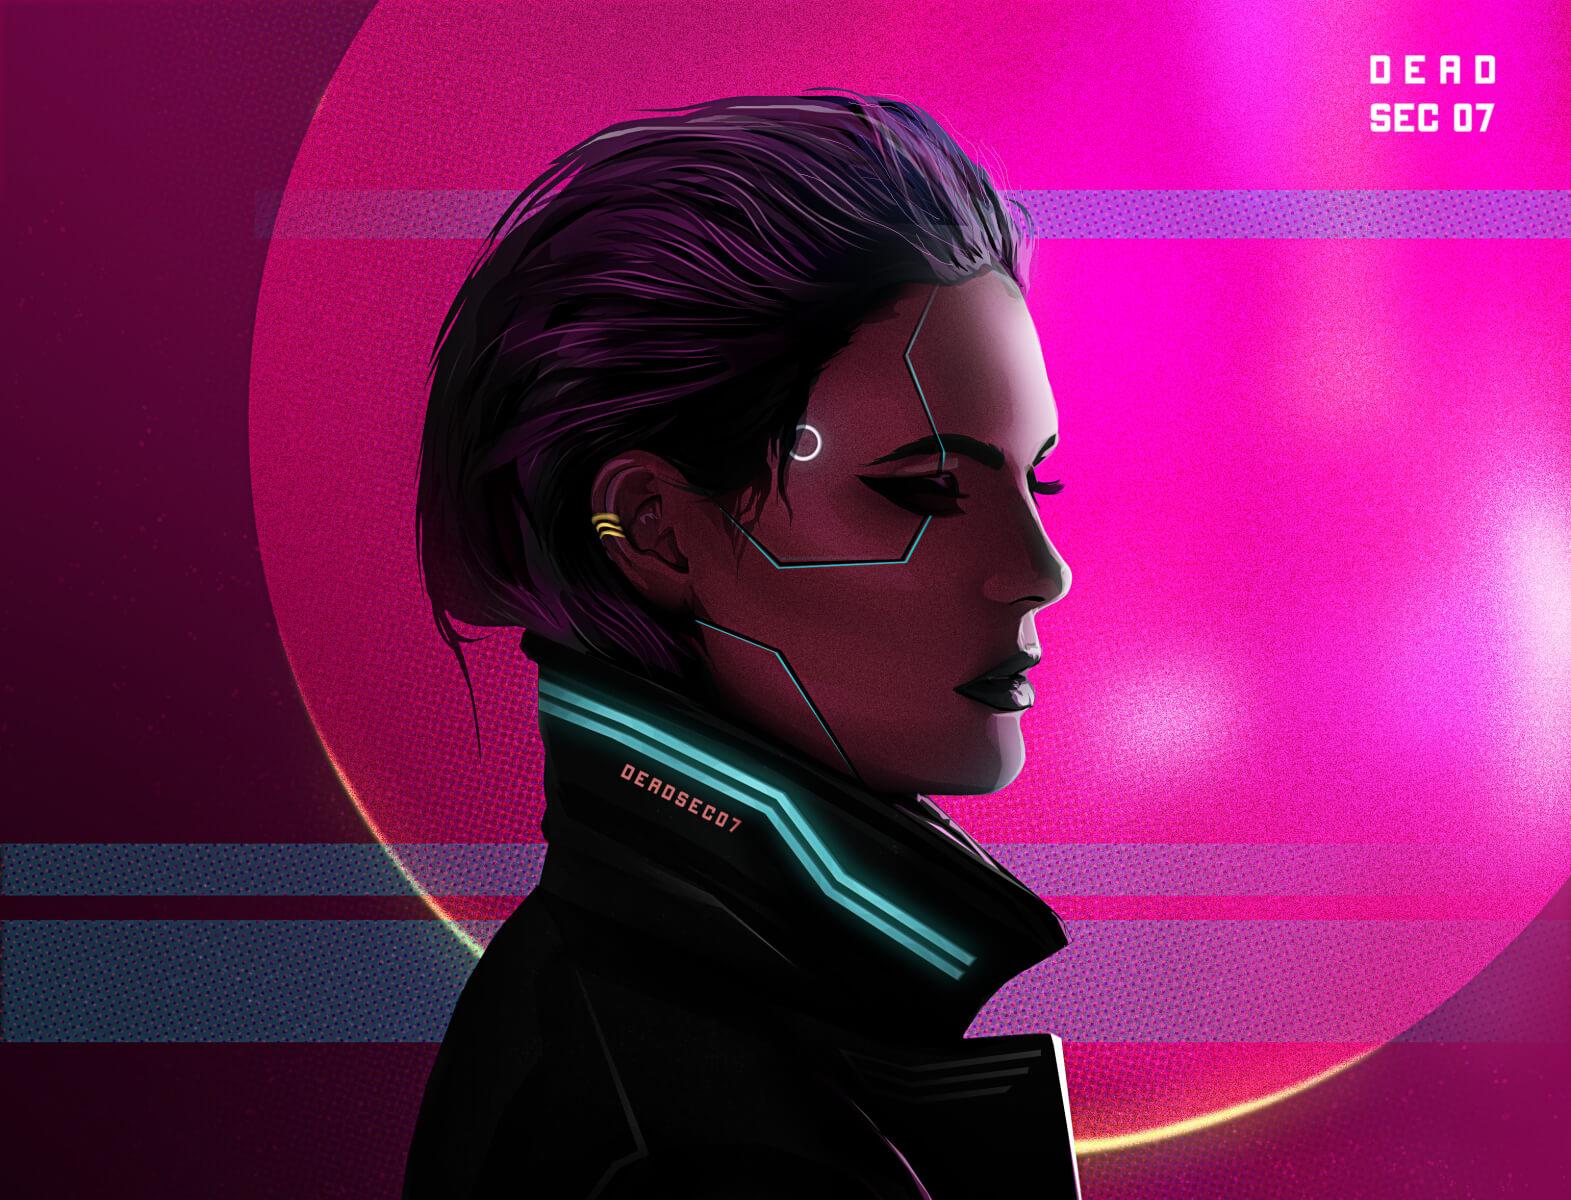 ASWIN K – Neon Rider | Cyberpunk